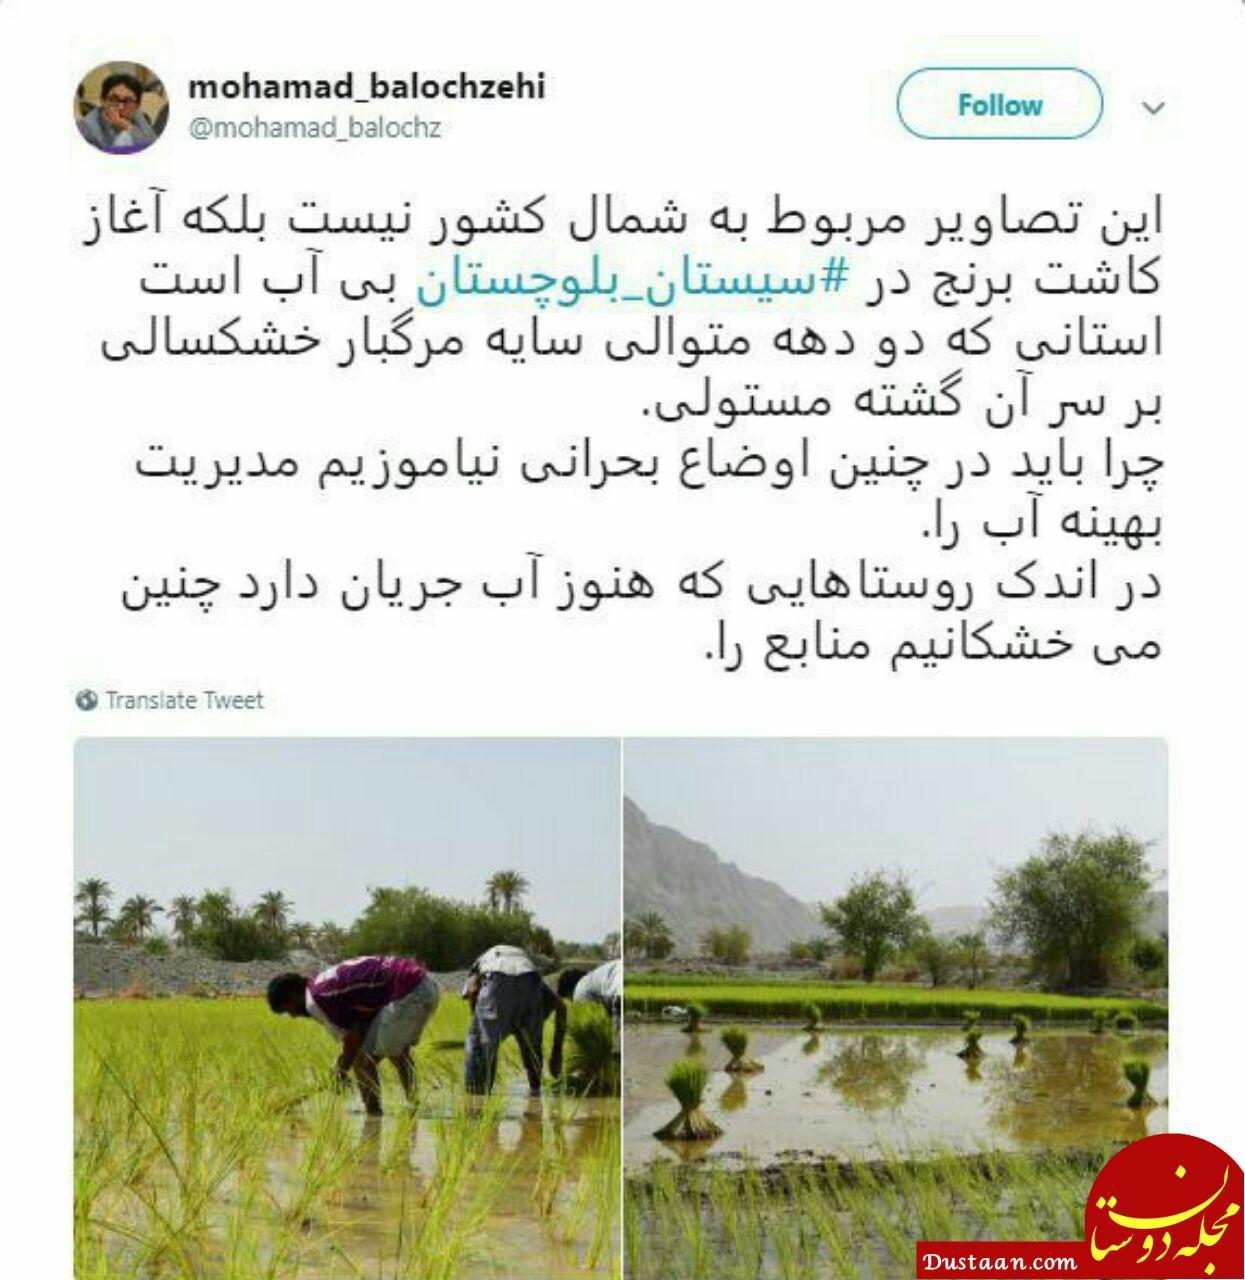 www.dustaan.com کاشت برنج در سیستان و بلوچستان بی آب! +عکس